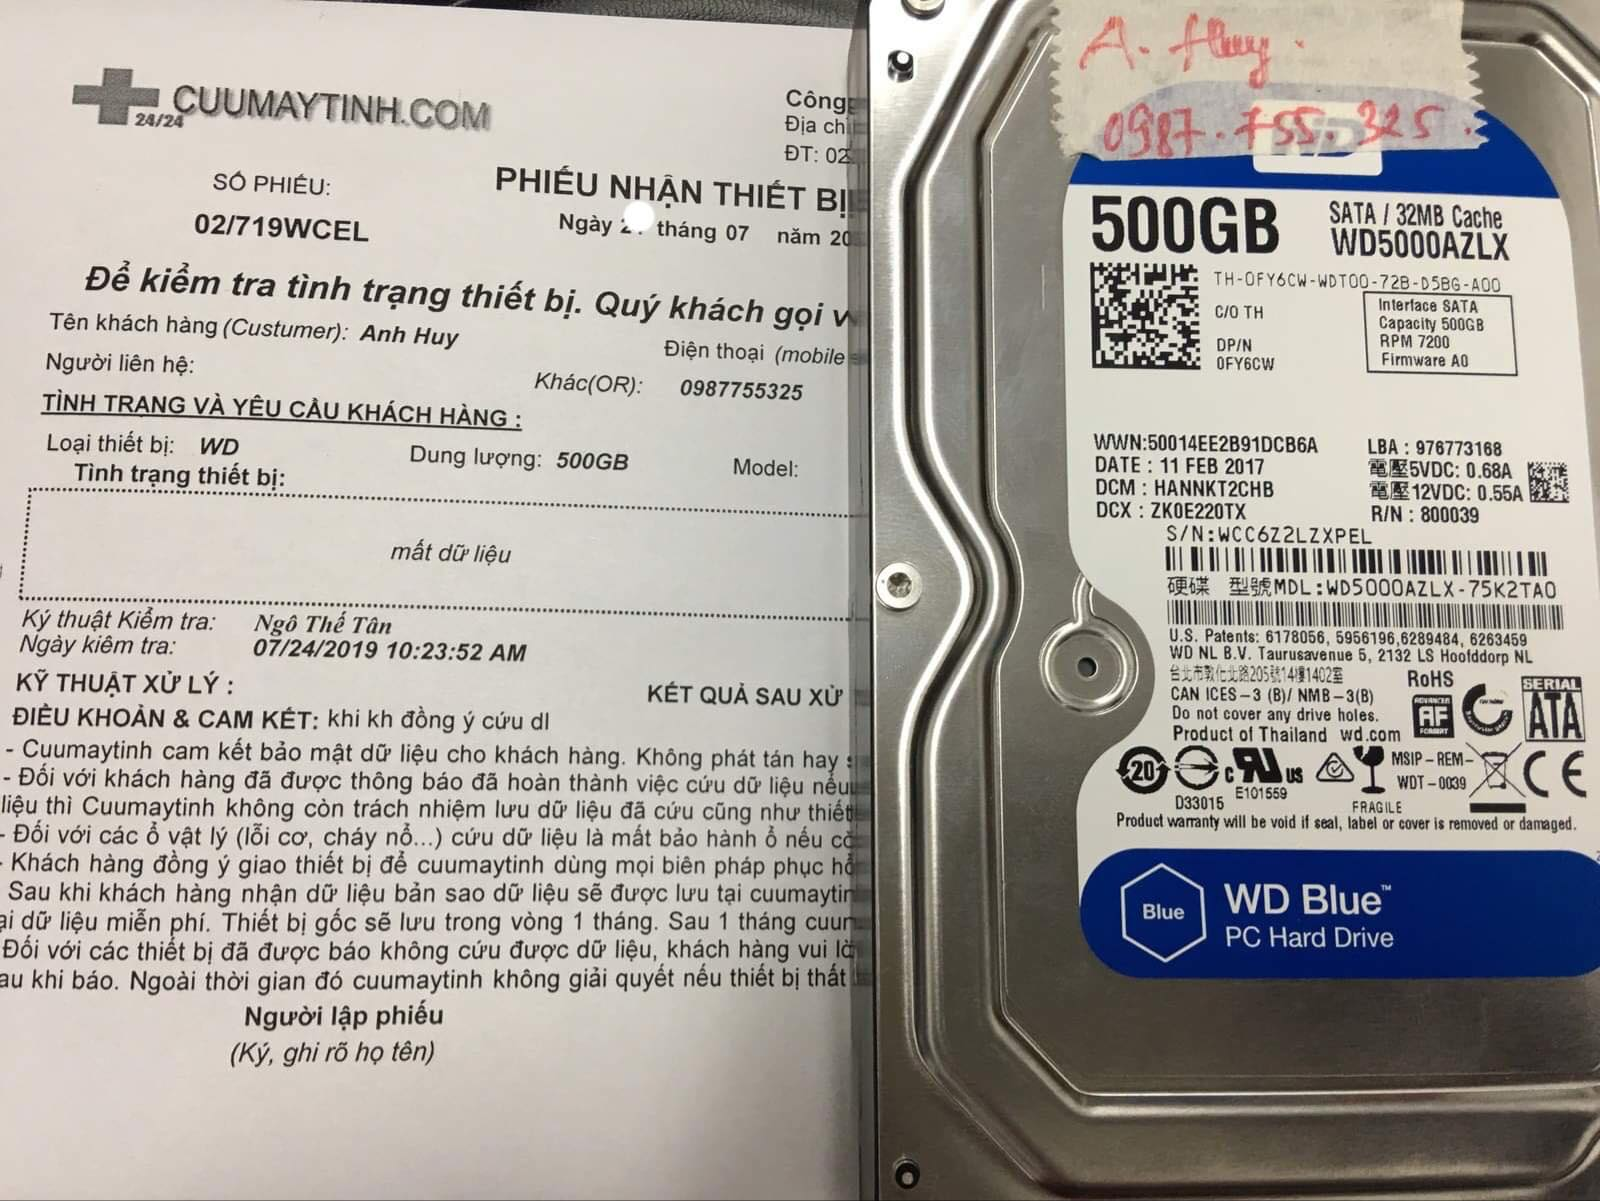 Cứu dữ liệu ổ cứng Western 500GB mất dữ liệu 27/07/2019 - cuumaytinh